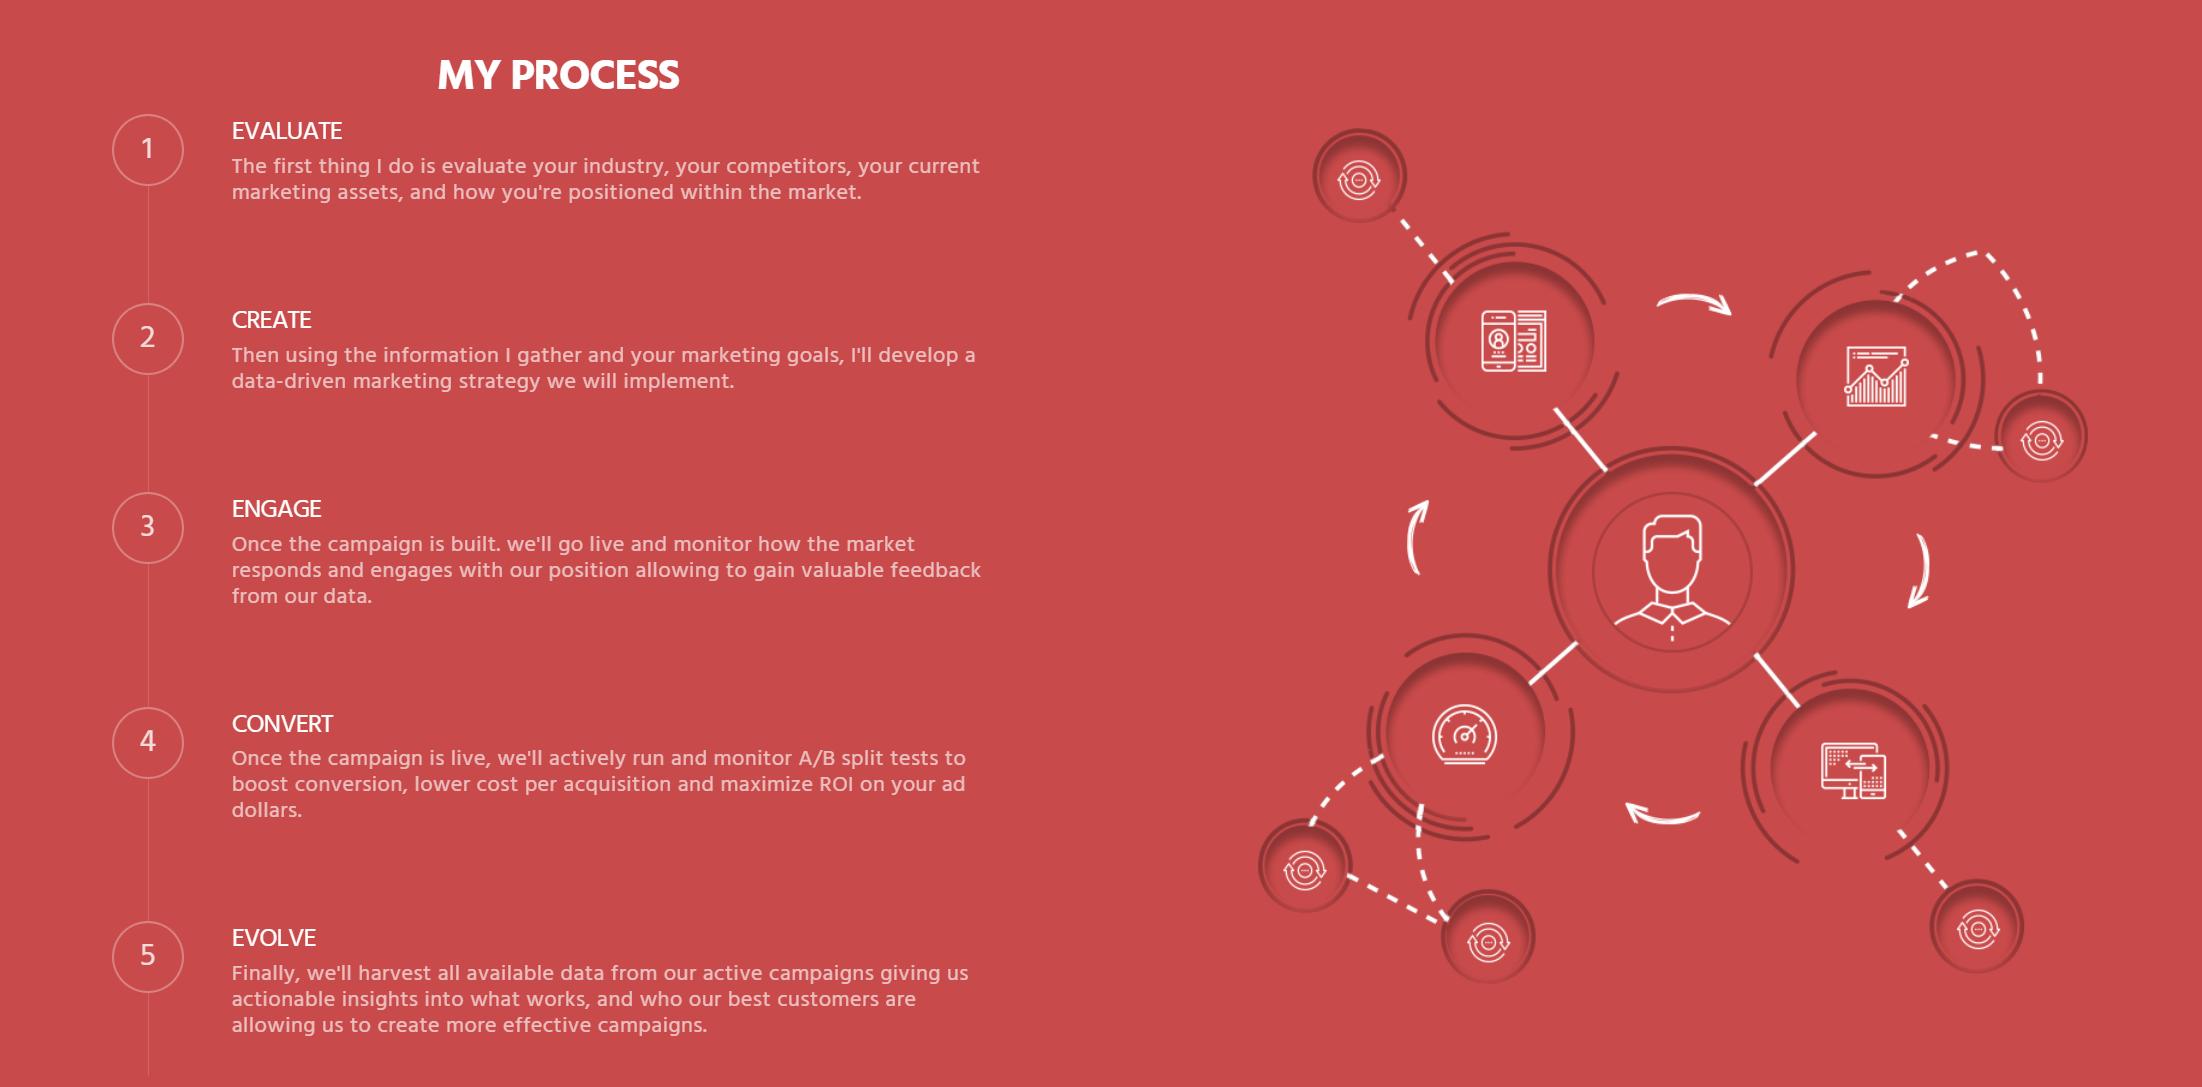 Marketing consultant website - example 8